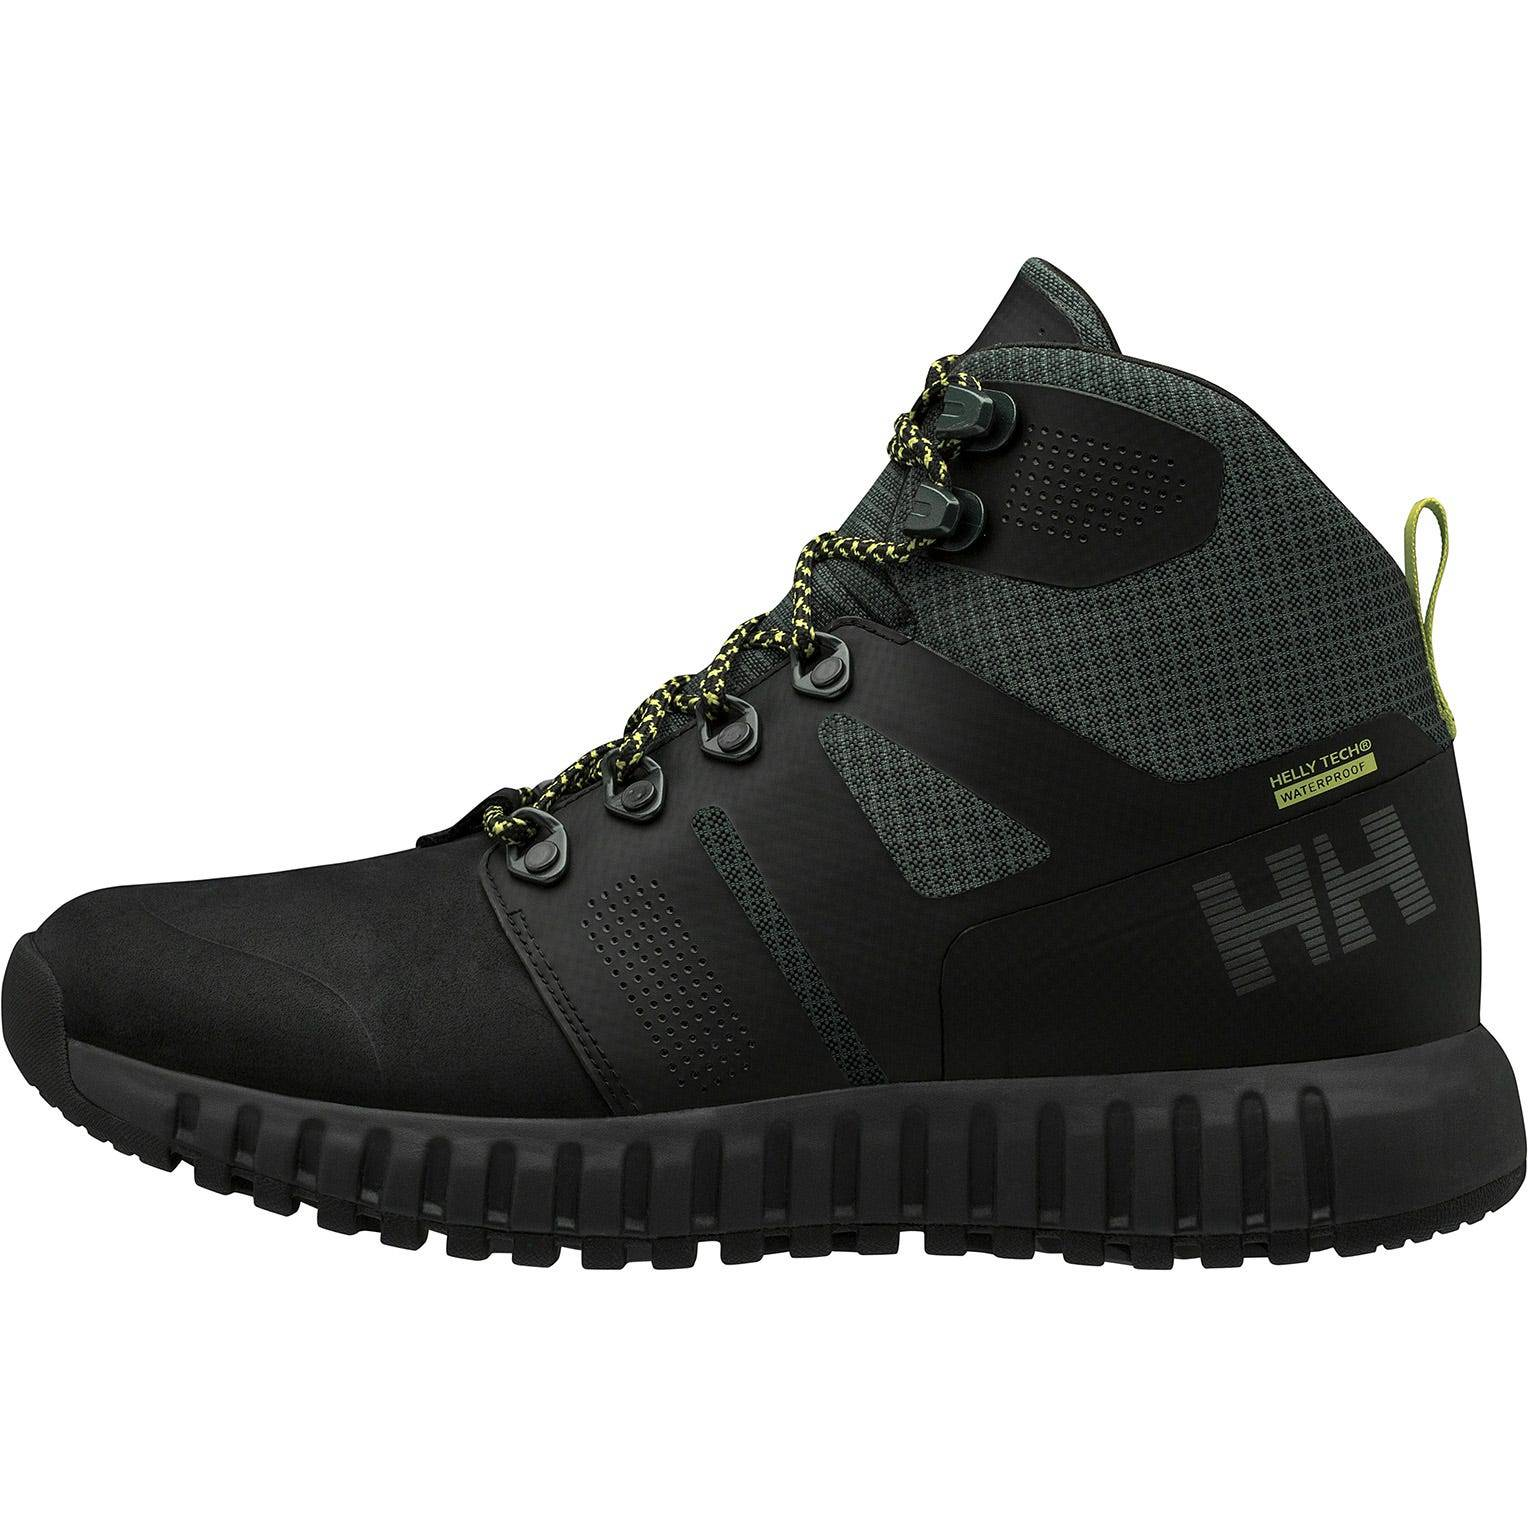 Helly Hansen Vanir Gallivant Ht Mens Hiking Boot Black 41/8